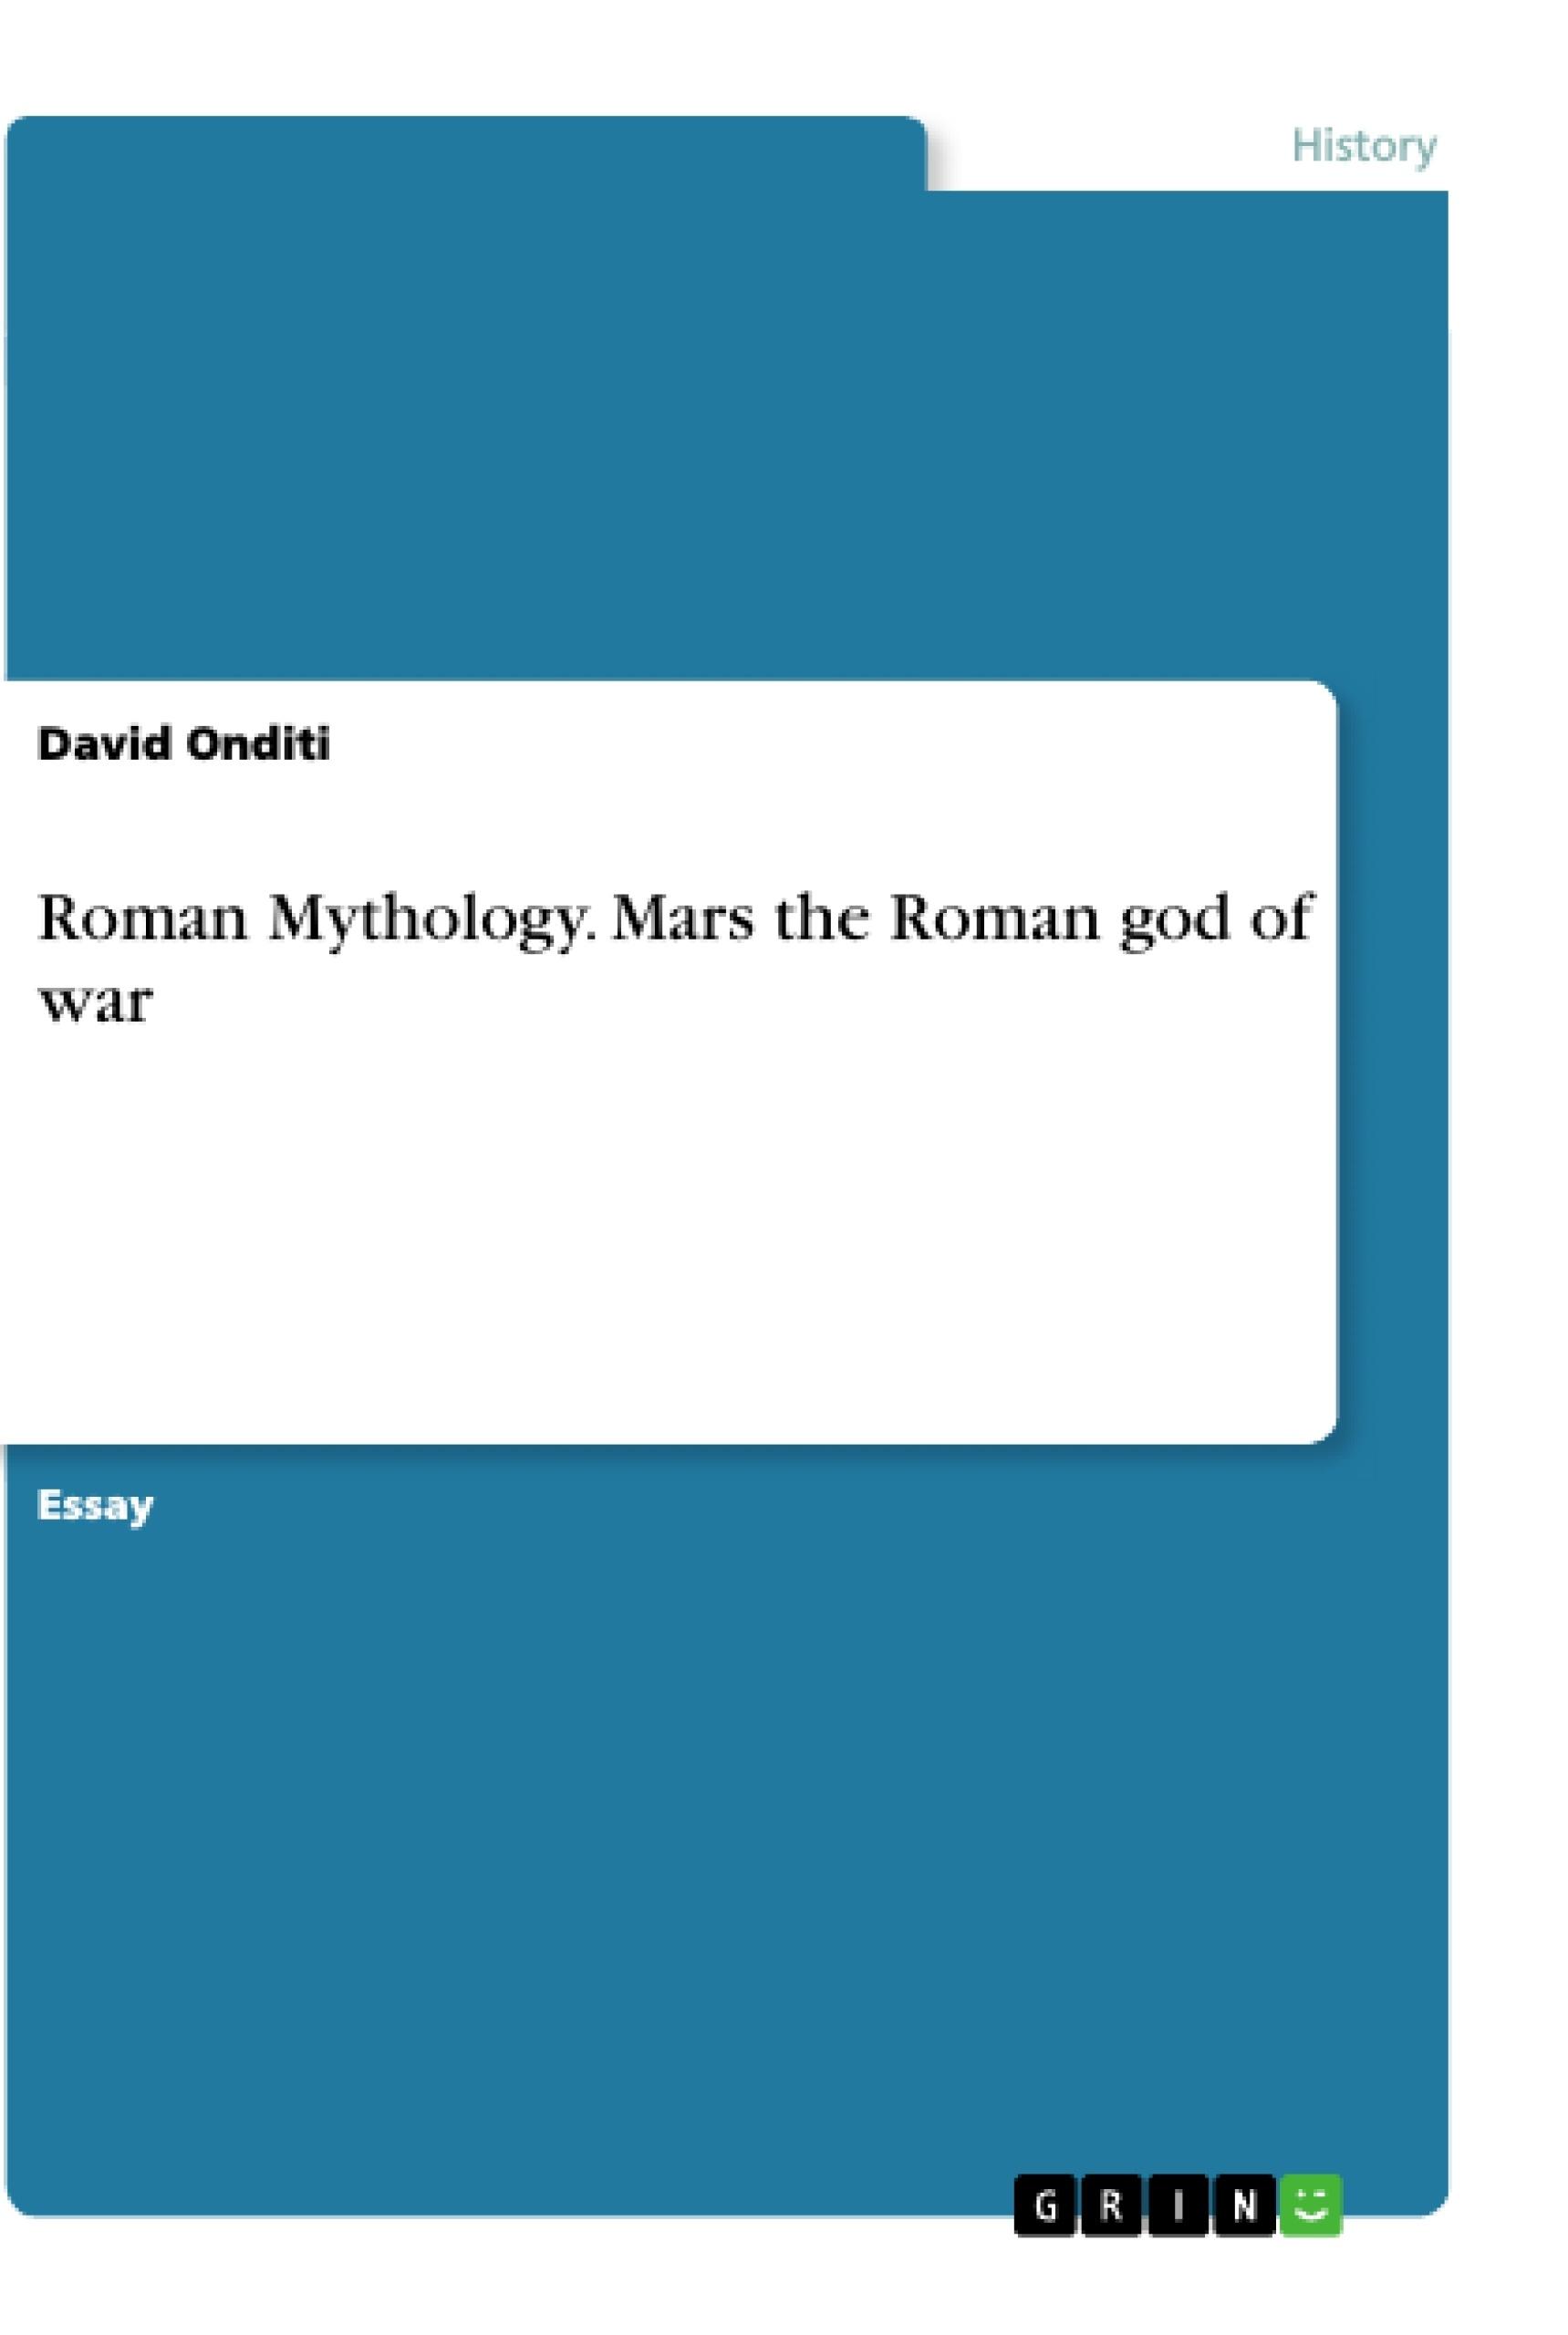 Title: Roman Mythology. Mars the Roman god of war